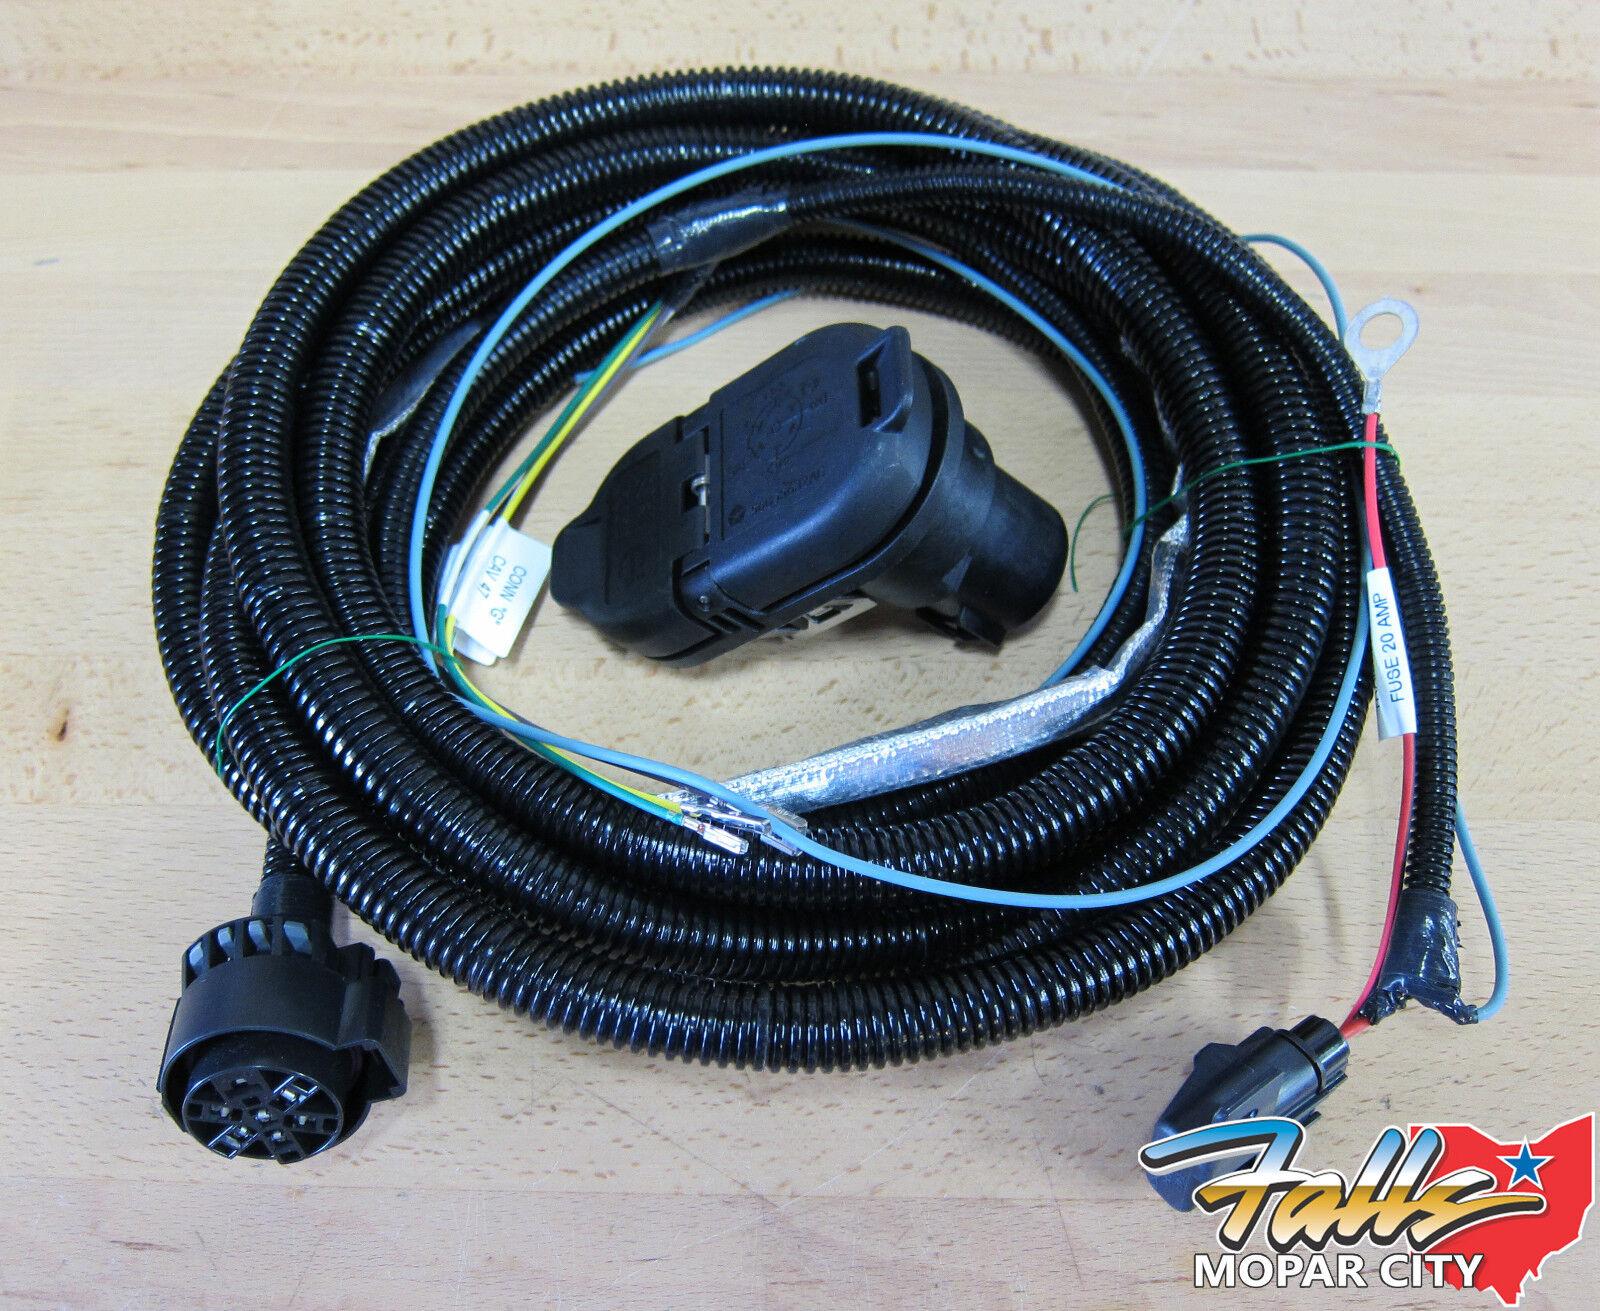 Toeing 2012 Jeep Cherokee Wire Harness Find Wiring Diagram 1988 Xj 2011 2013 Grand Dodge Durango Trailer Tow Rh Ebay Com Plug